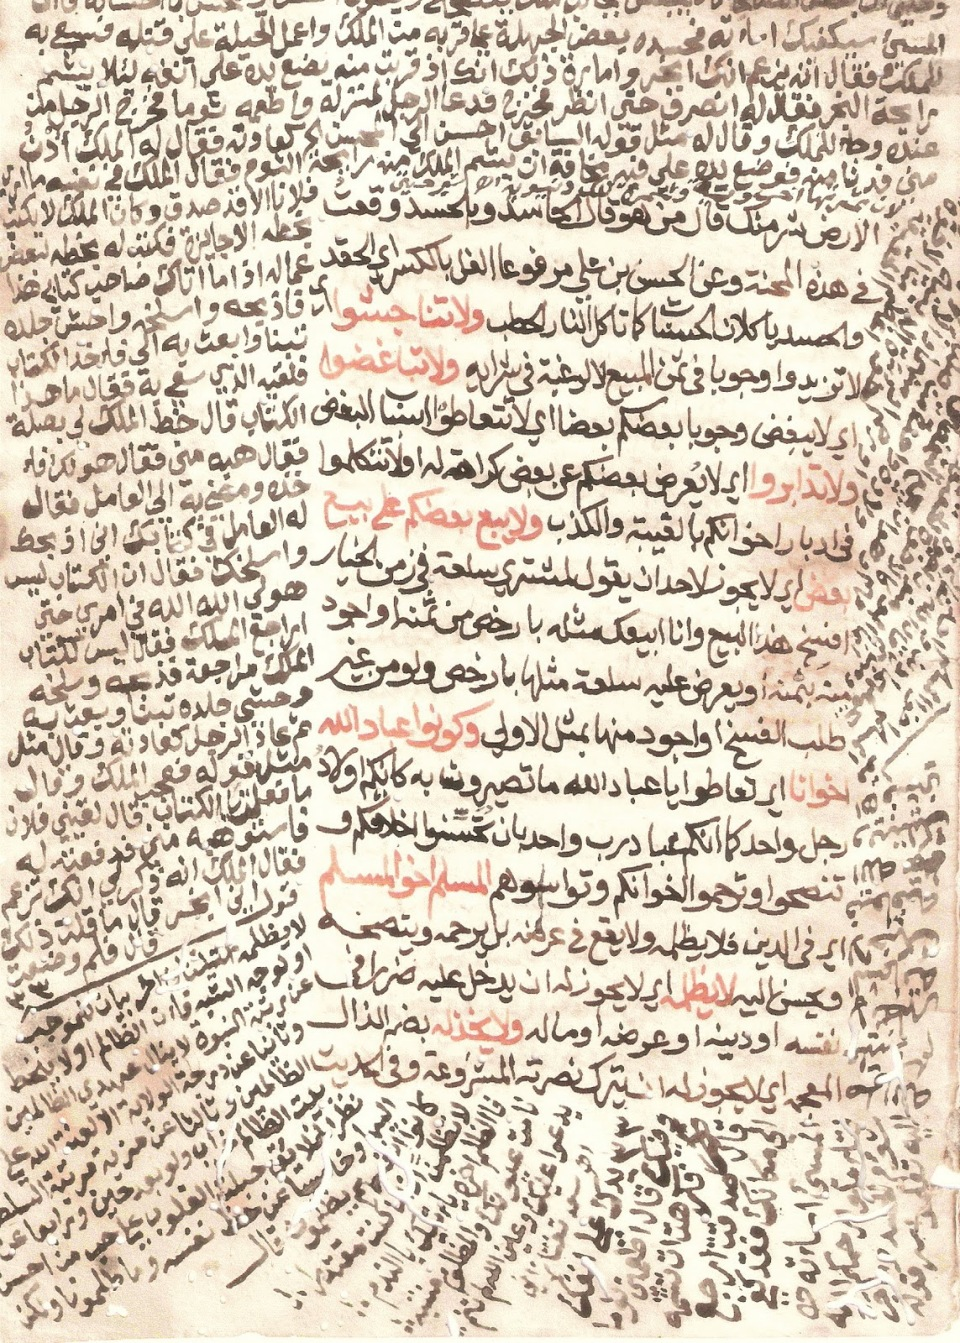 A manuscript containing hadith